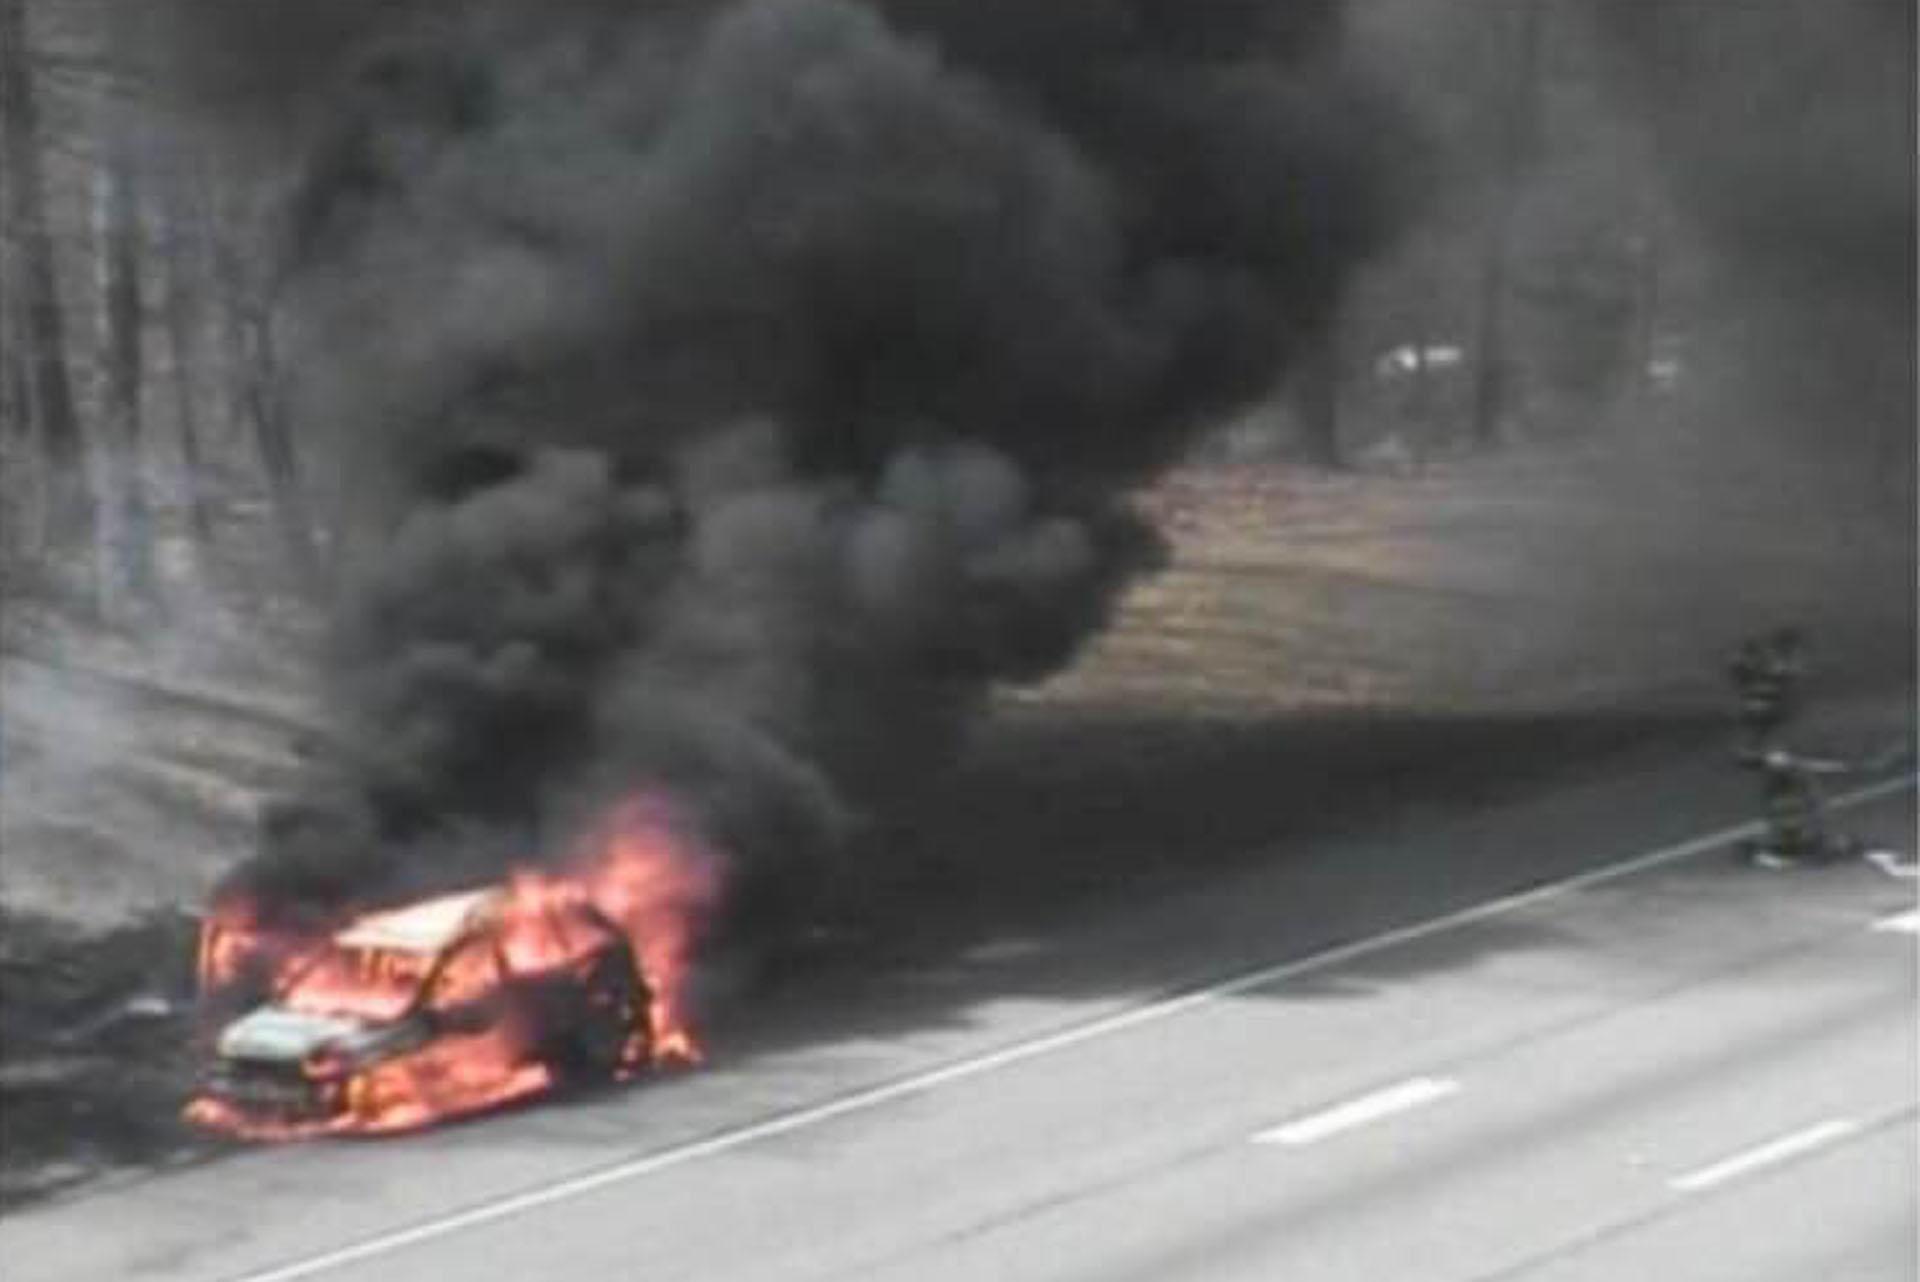 Clinton vehicle fire I-95 4_14_19.jpg